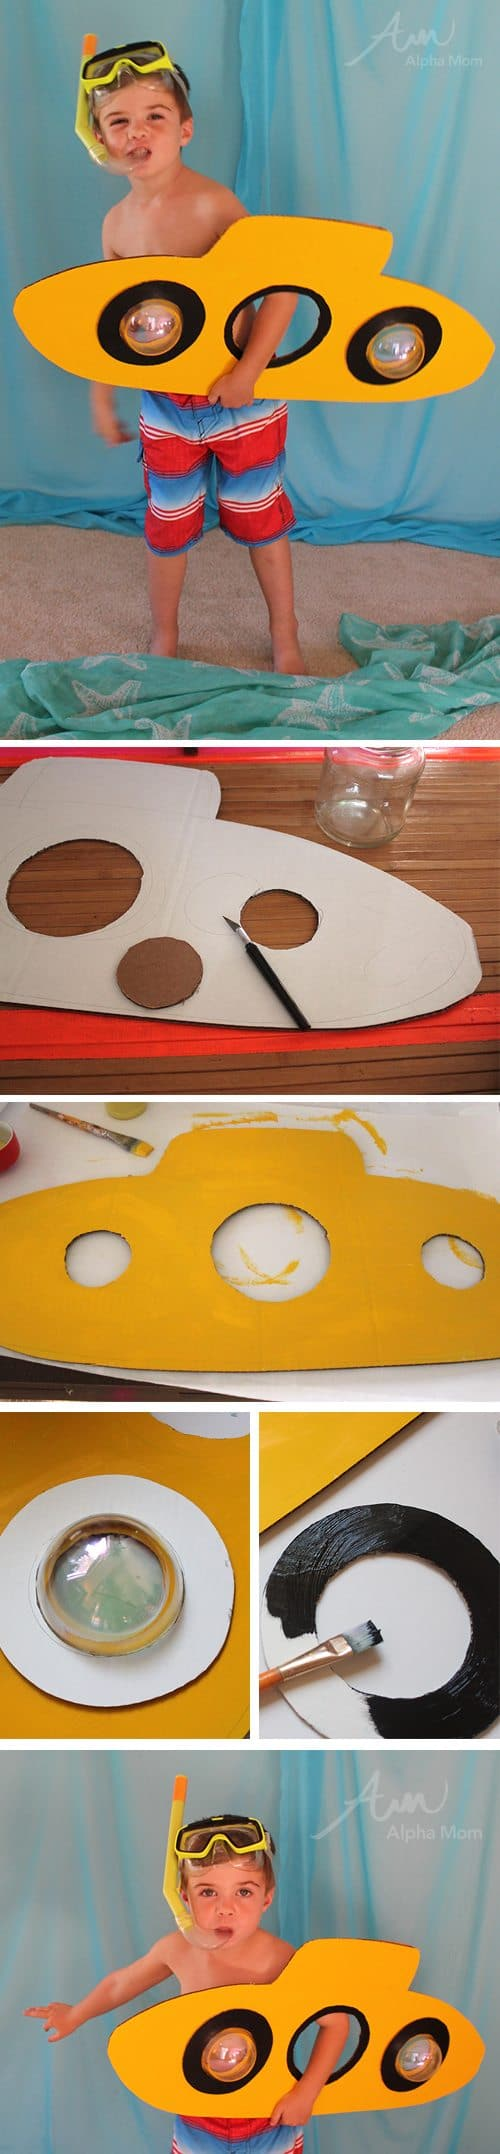 DIY Under-the-Sea Costumes: Submarine! by Brenda Ponnay for Alphamom.com